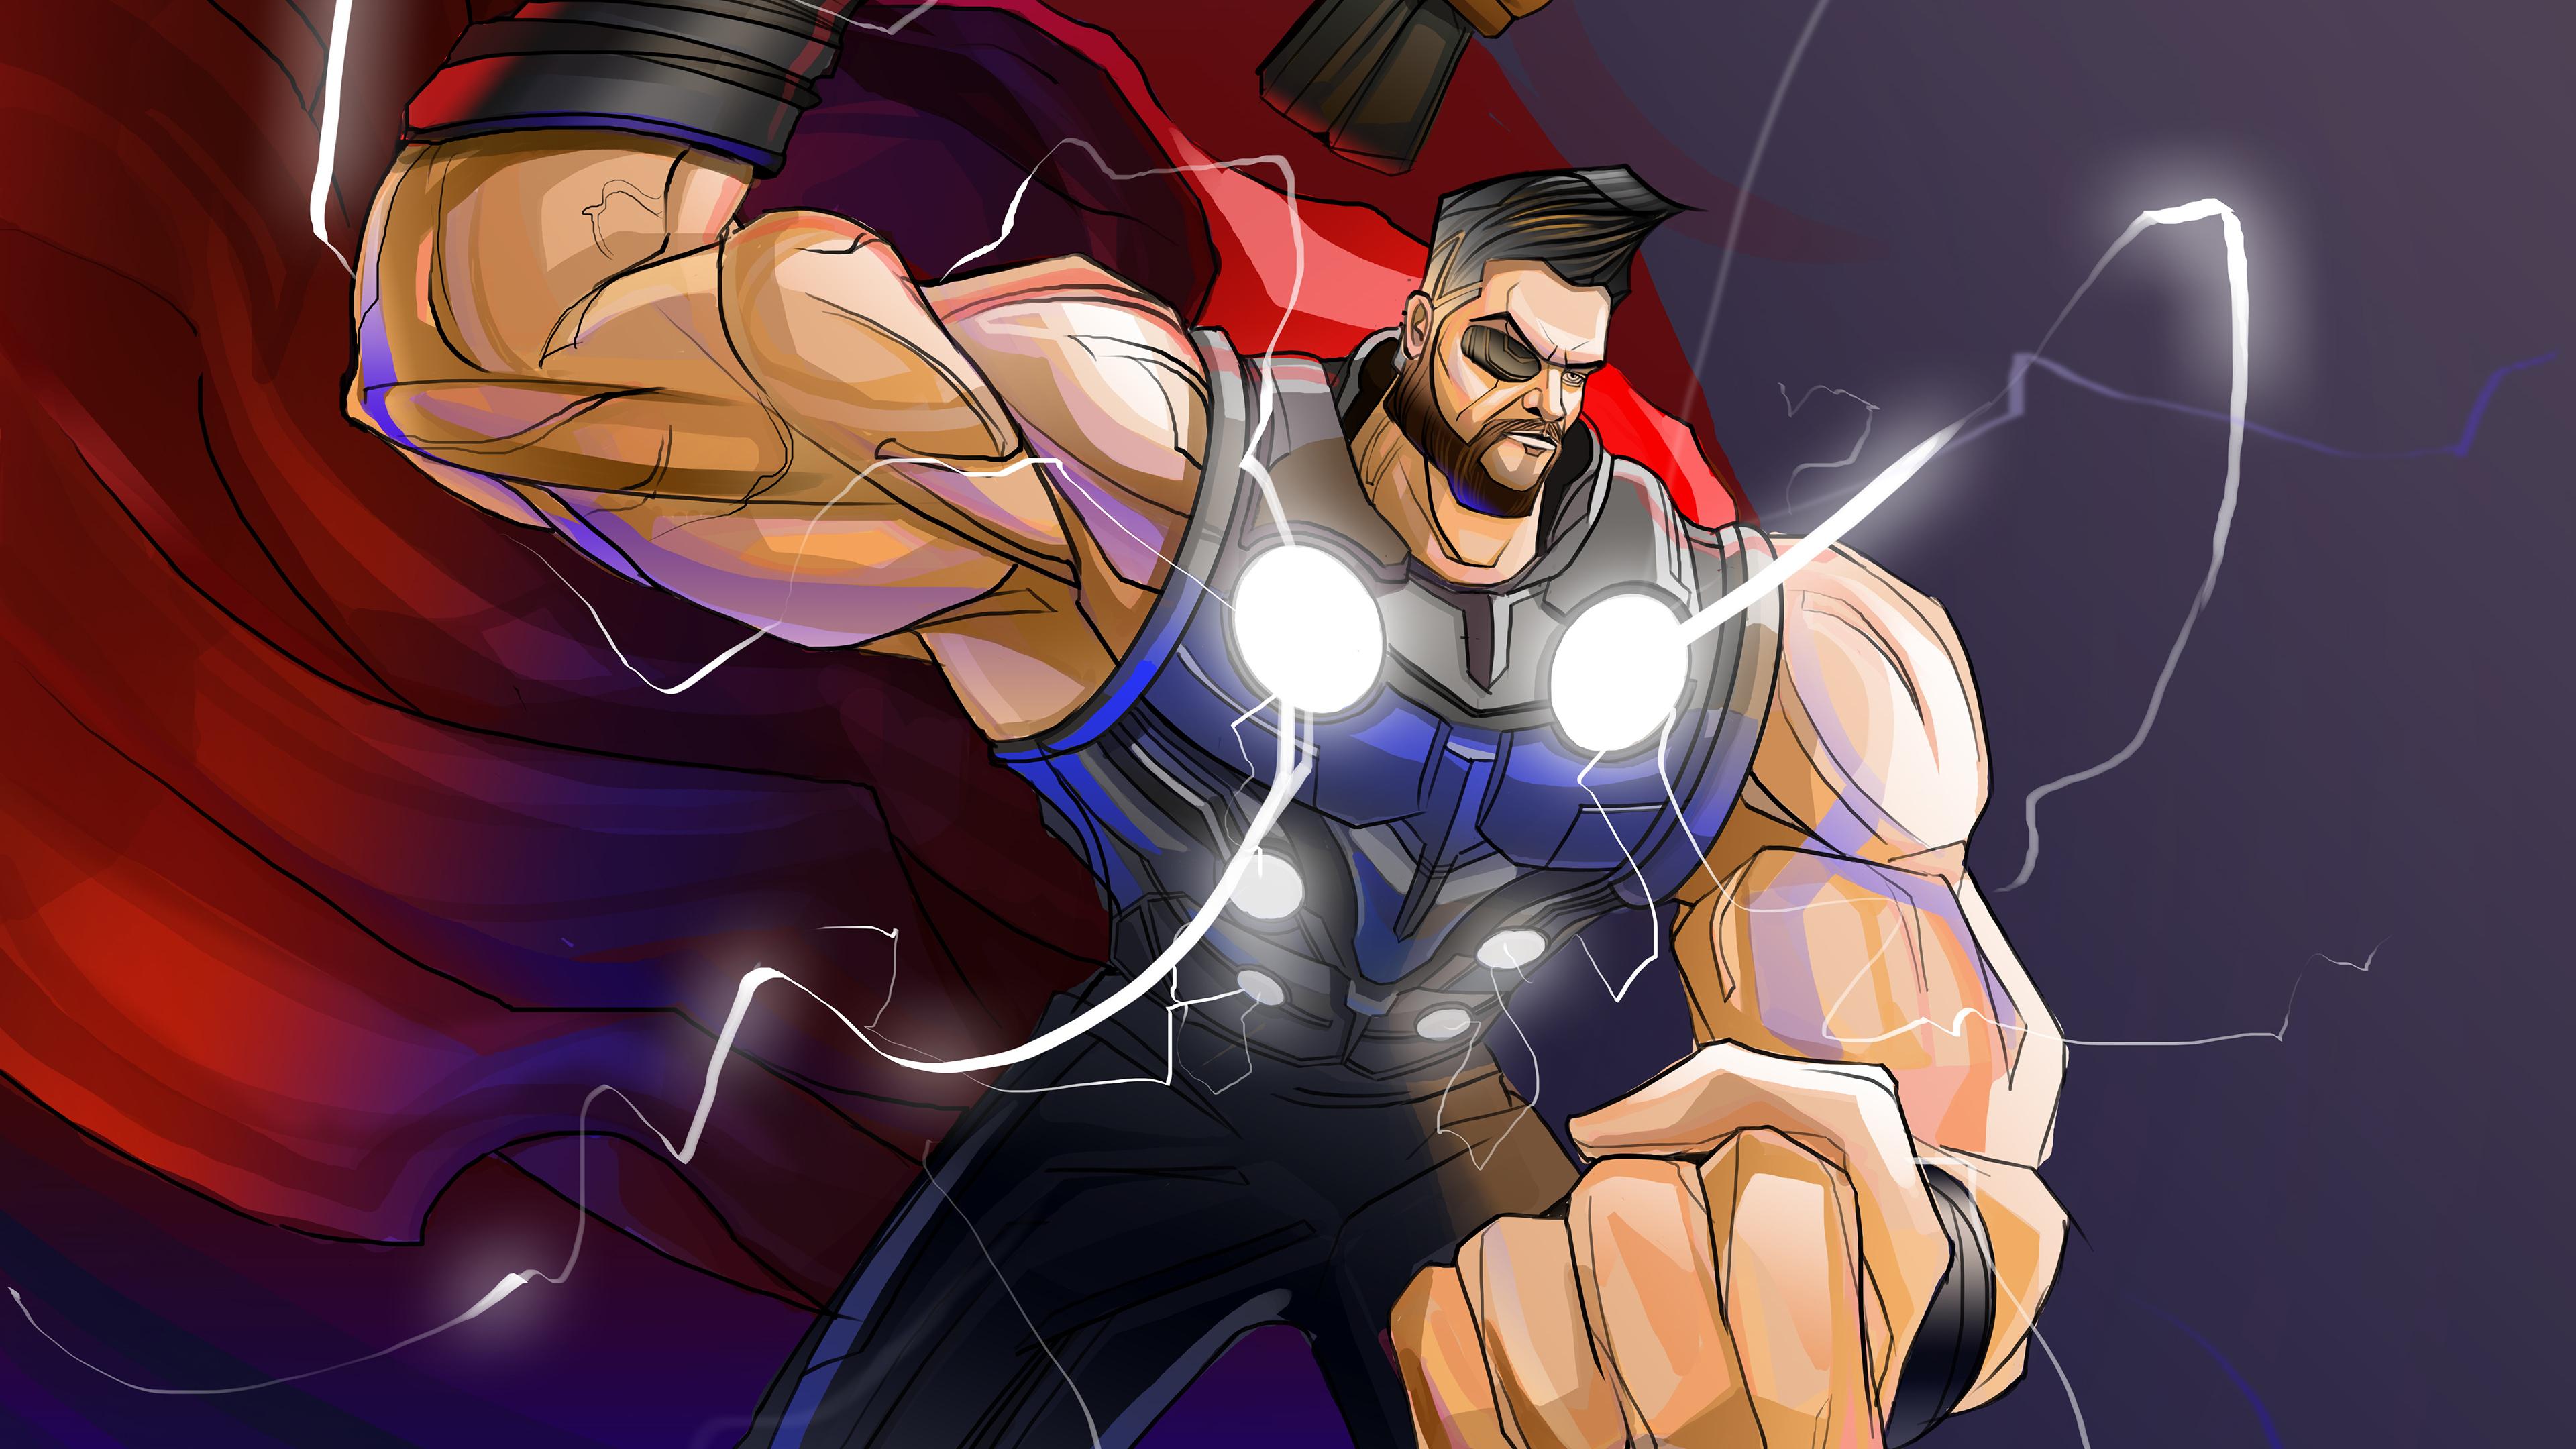 muscular thor 4k 1544286766 - Muscular Thor 4k - thor wallpapers, superheroes wallpapers, hd-wallpapers, digital art wallpapers, behance wallpapers, artwork wallpapers, 4k-wallpapers